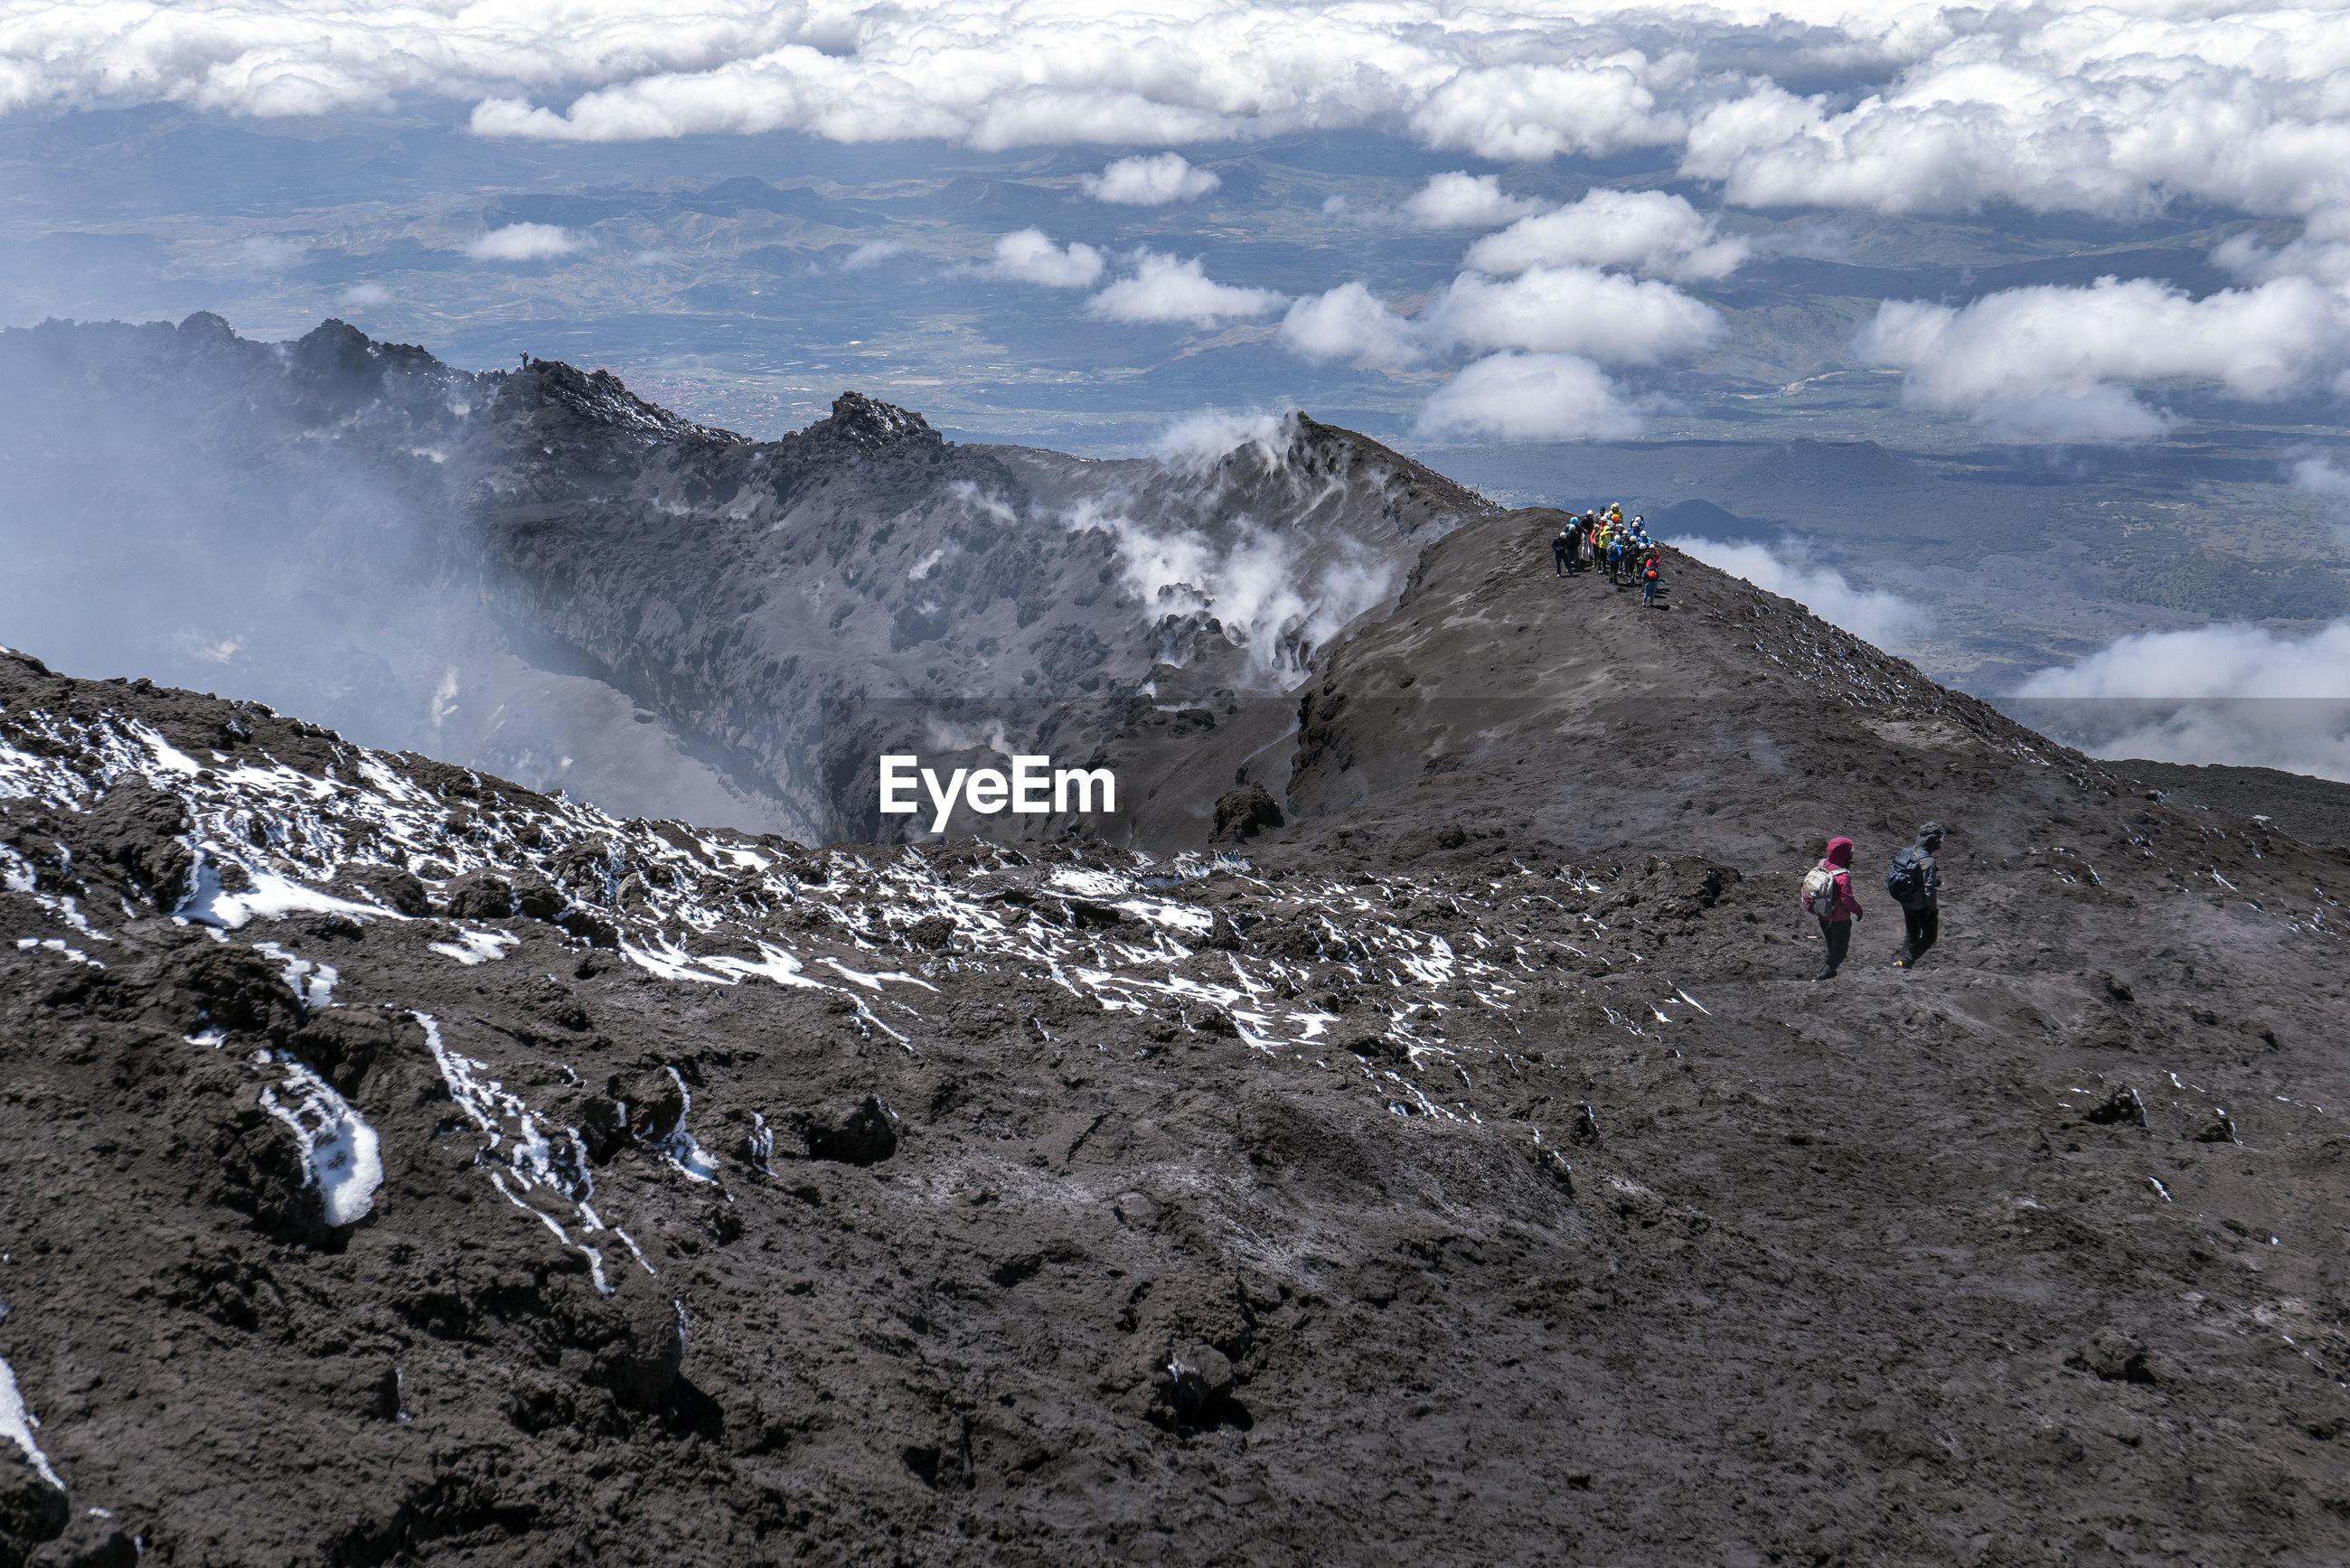 MEN WALKING ON MOUNTAIN AGAINST SKY